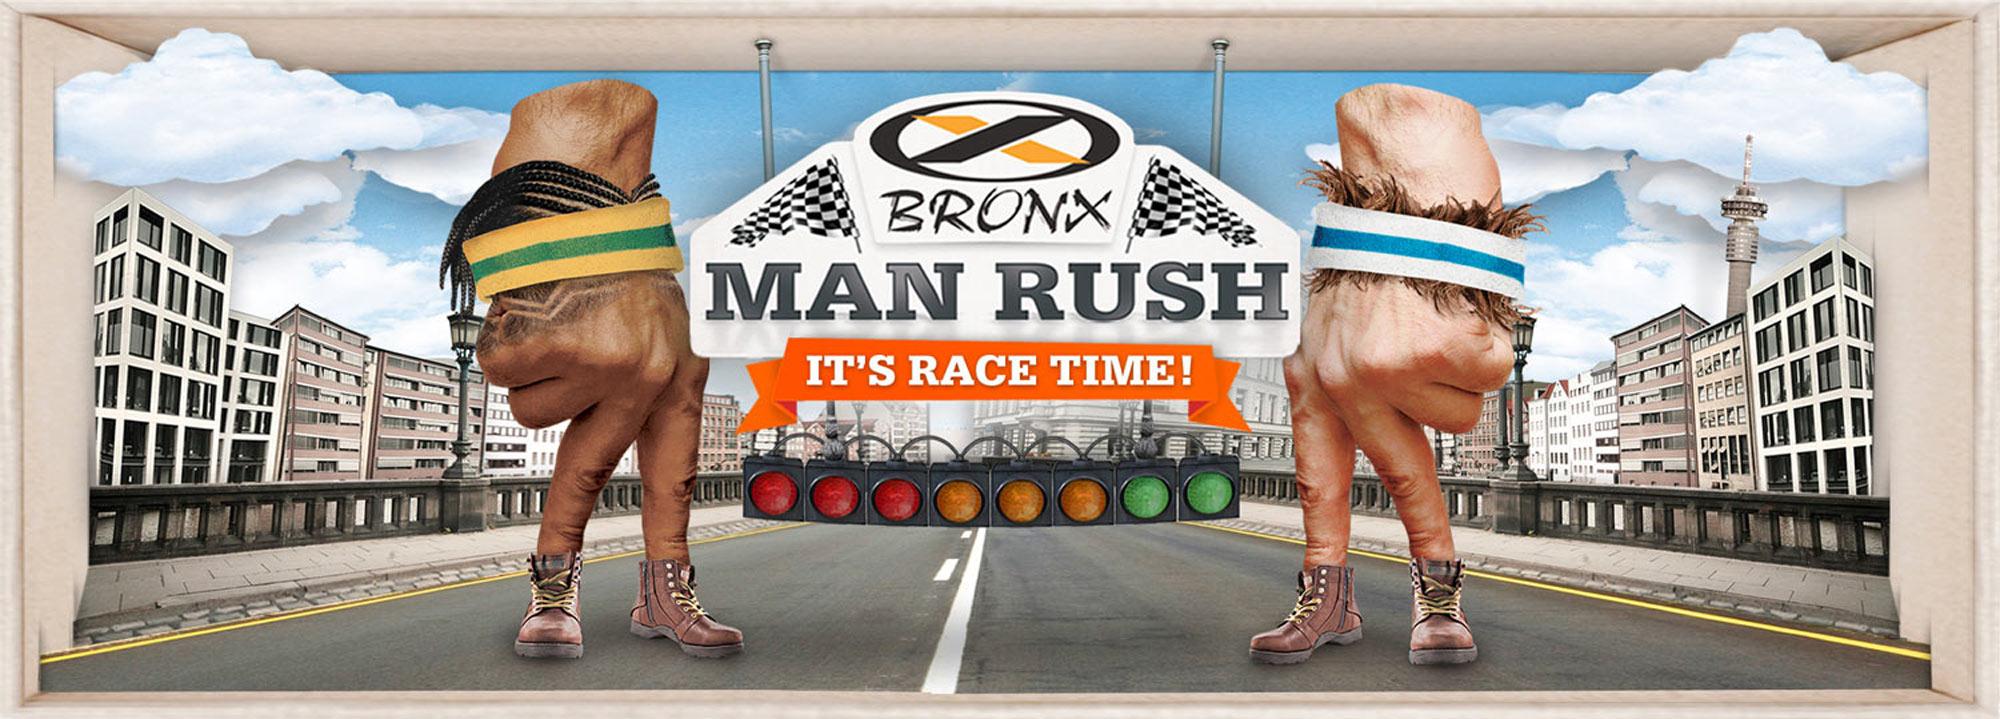 NEW-Bronx-Man-rush-page-header.jpg